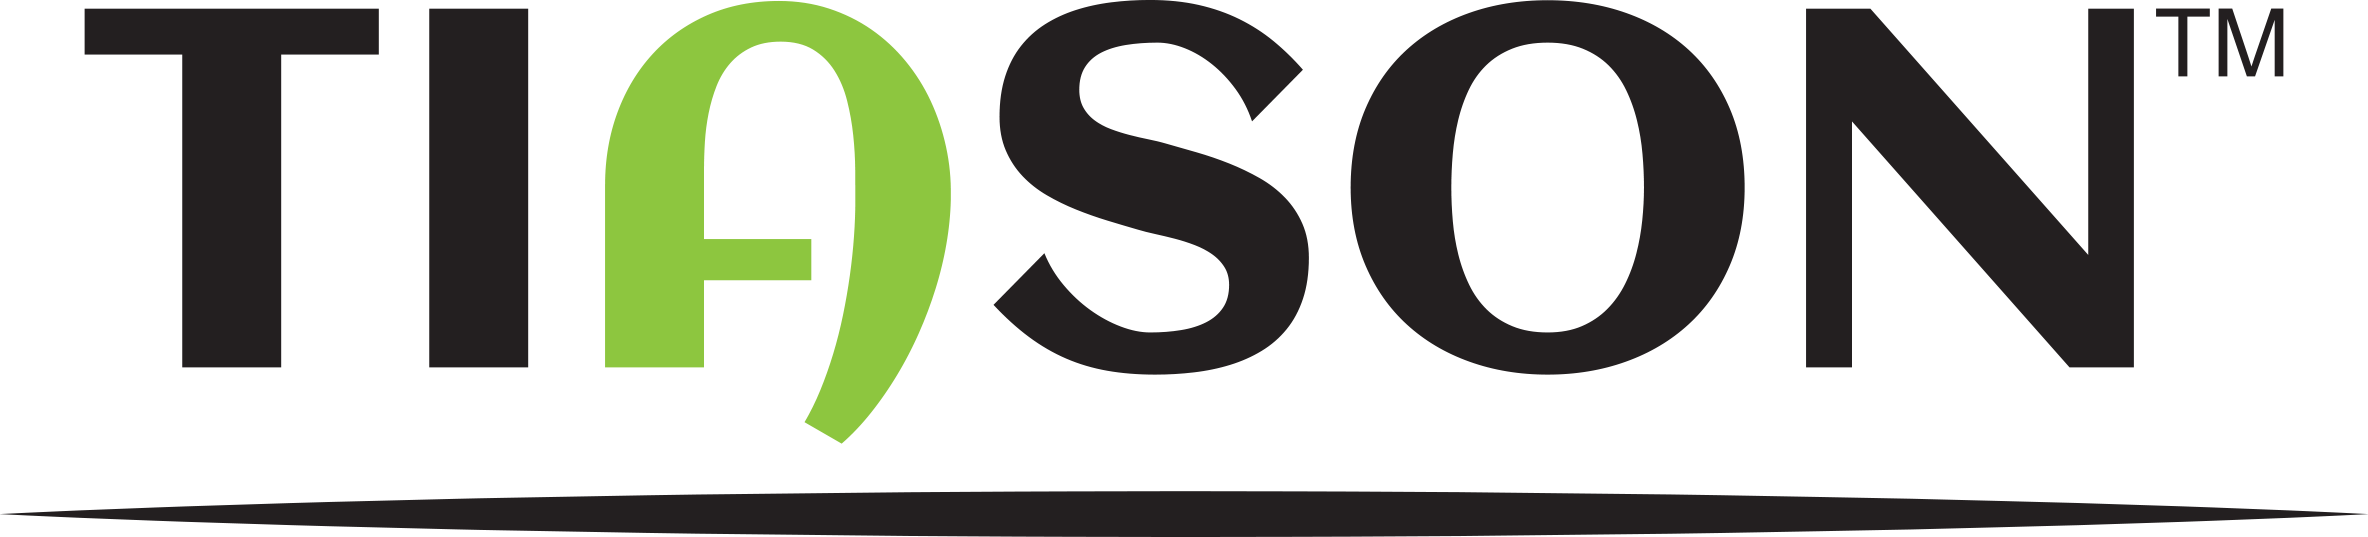 Tiason Logo